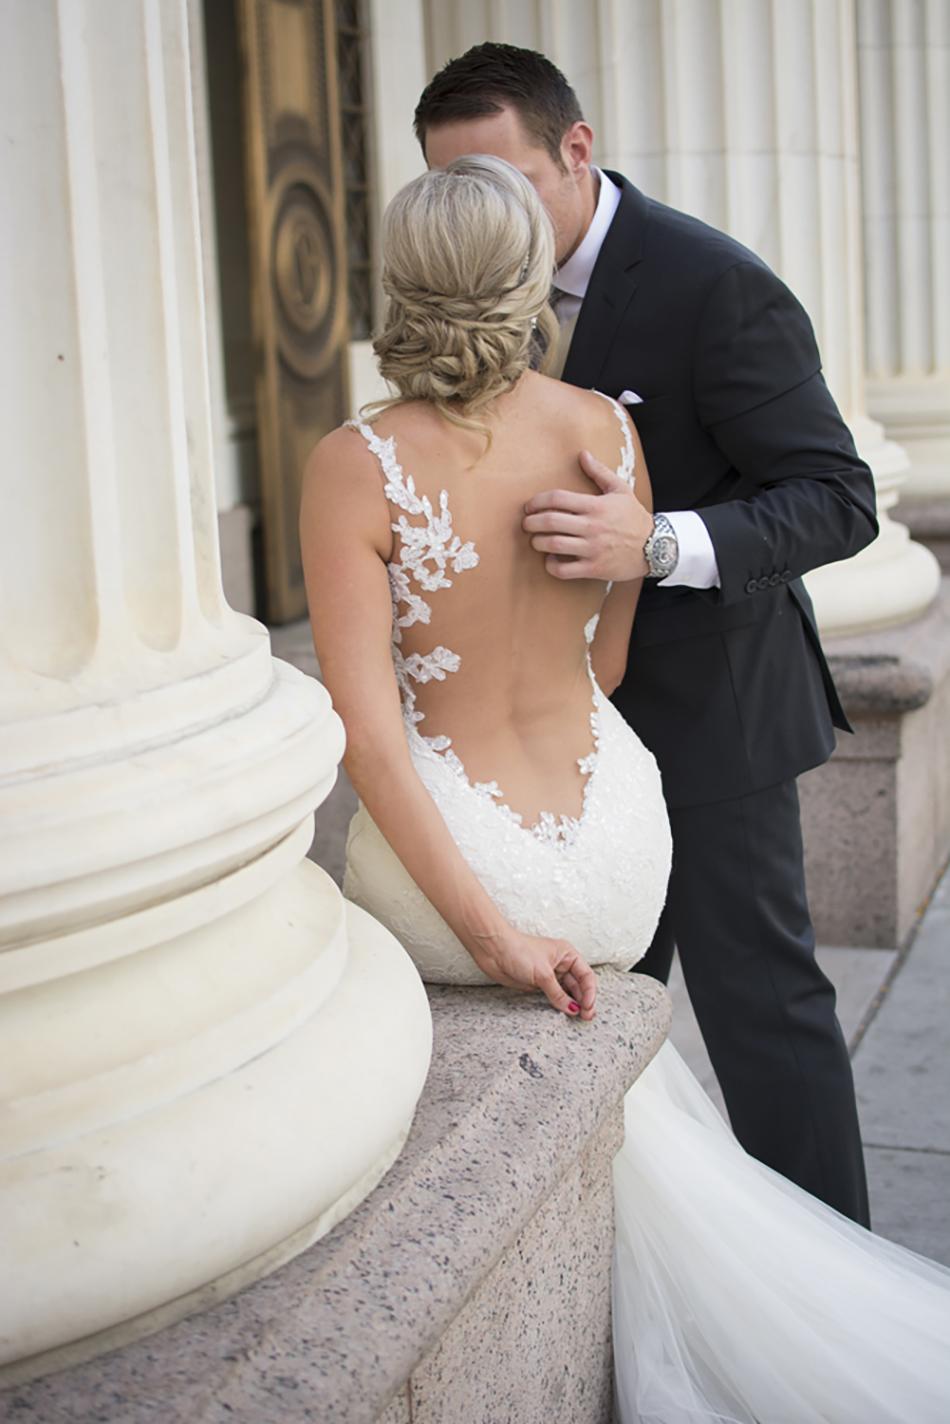 watters-realwedding-09.jpg